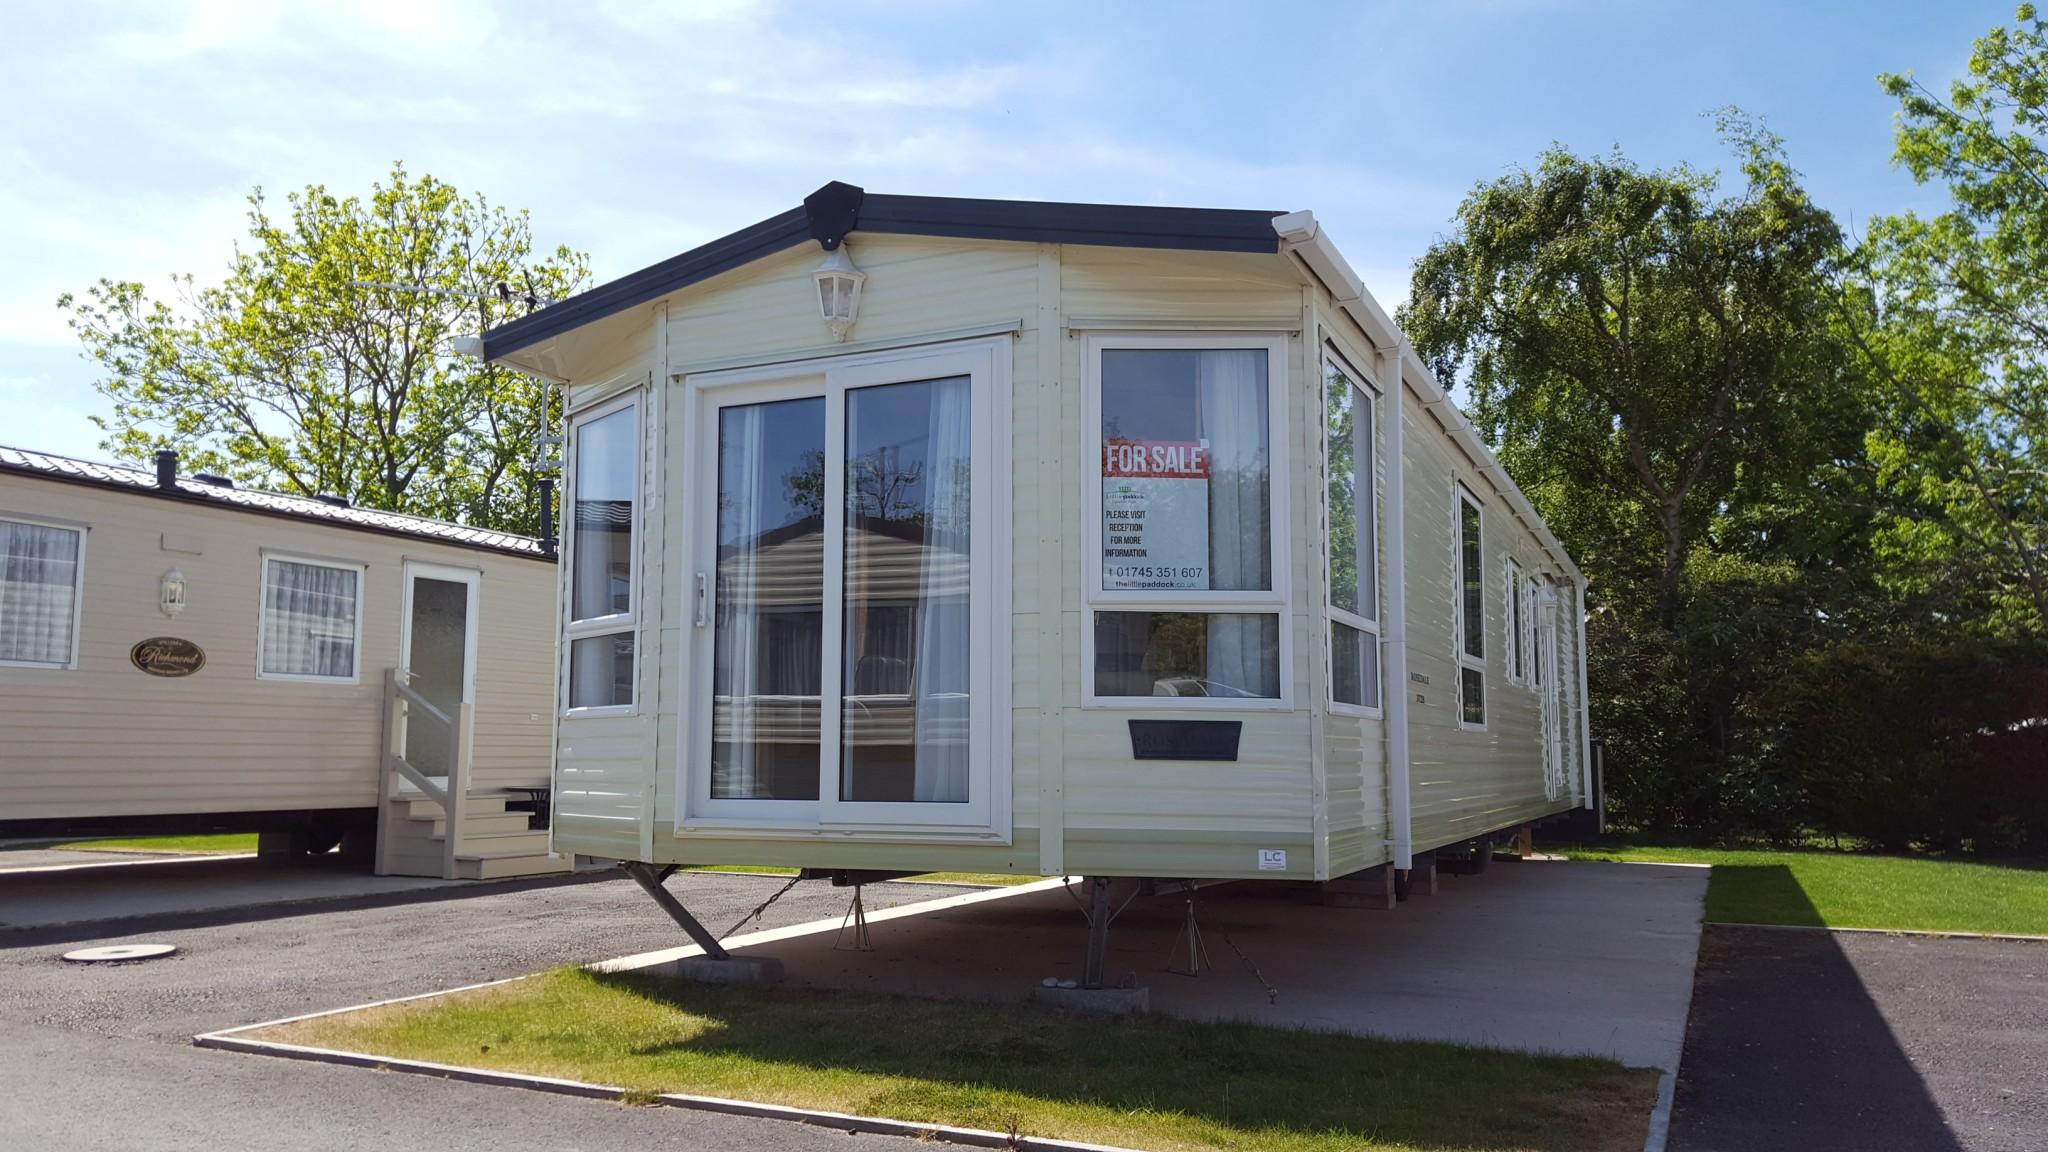 Simple  Caravan For Sale  Bathroom Bk Bluebird Grosvenor Caravan For Sale